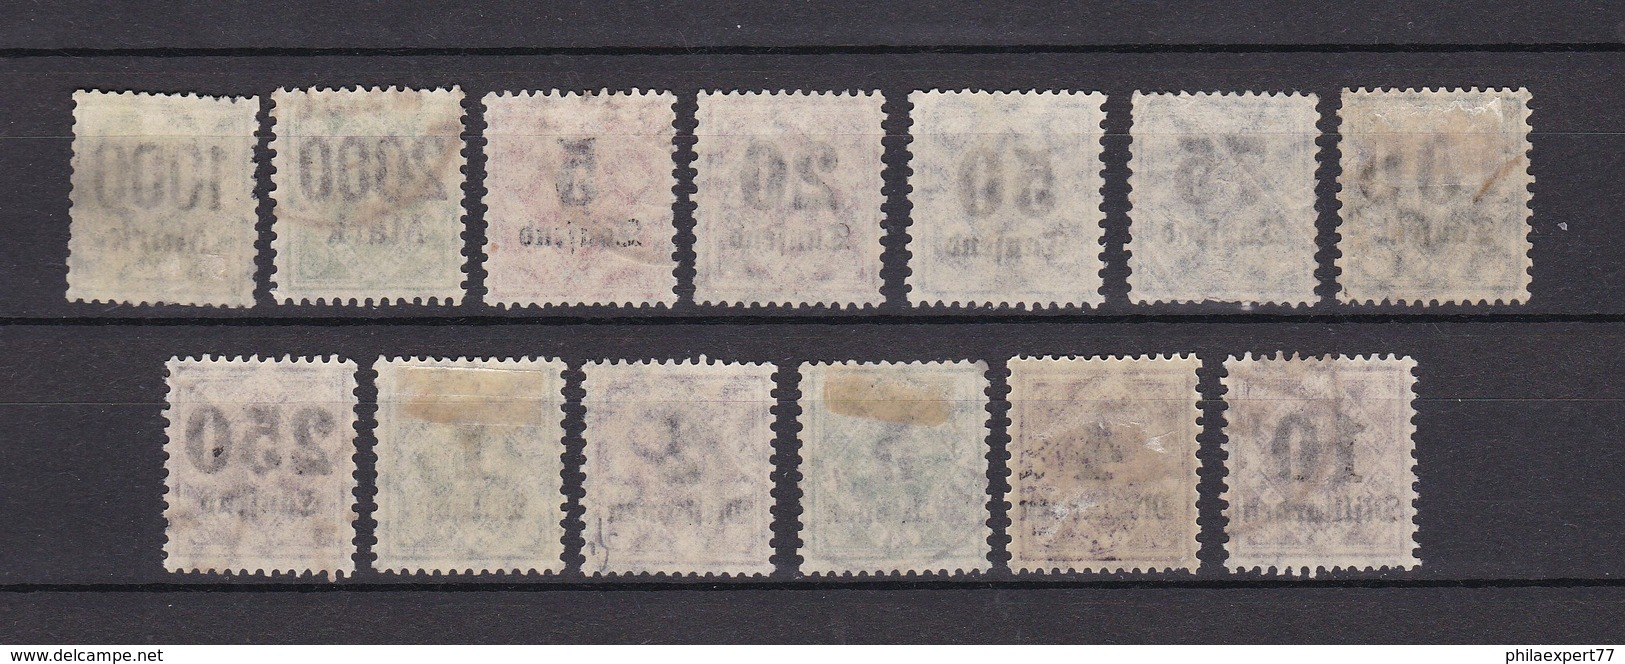 Wuerttemberg - Dienstmarken - 1923 - Michel Nr. 171/183 - 117 Euro - Wuerttemberg